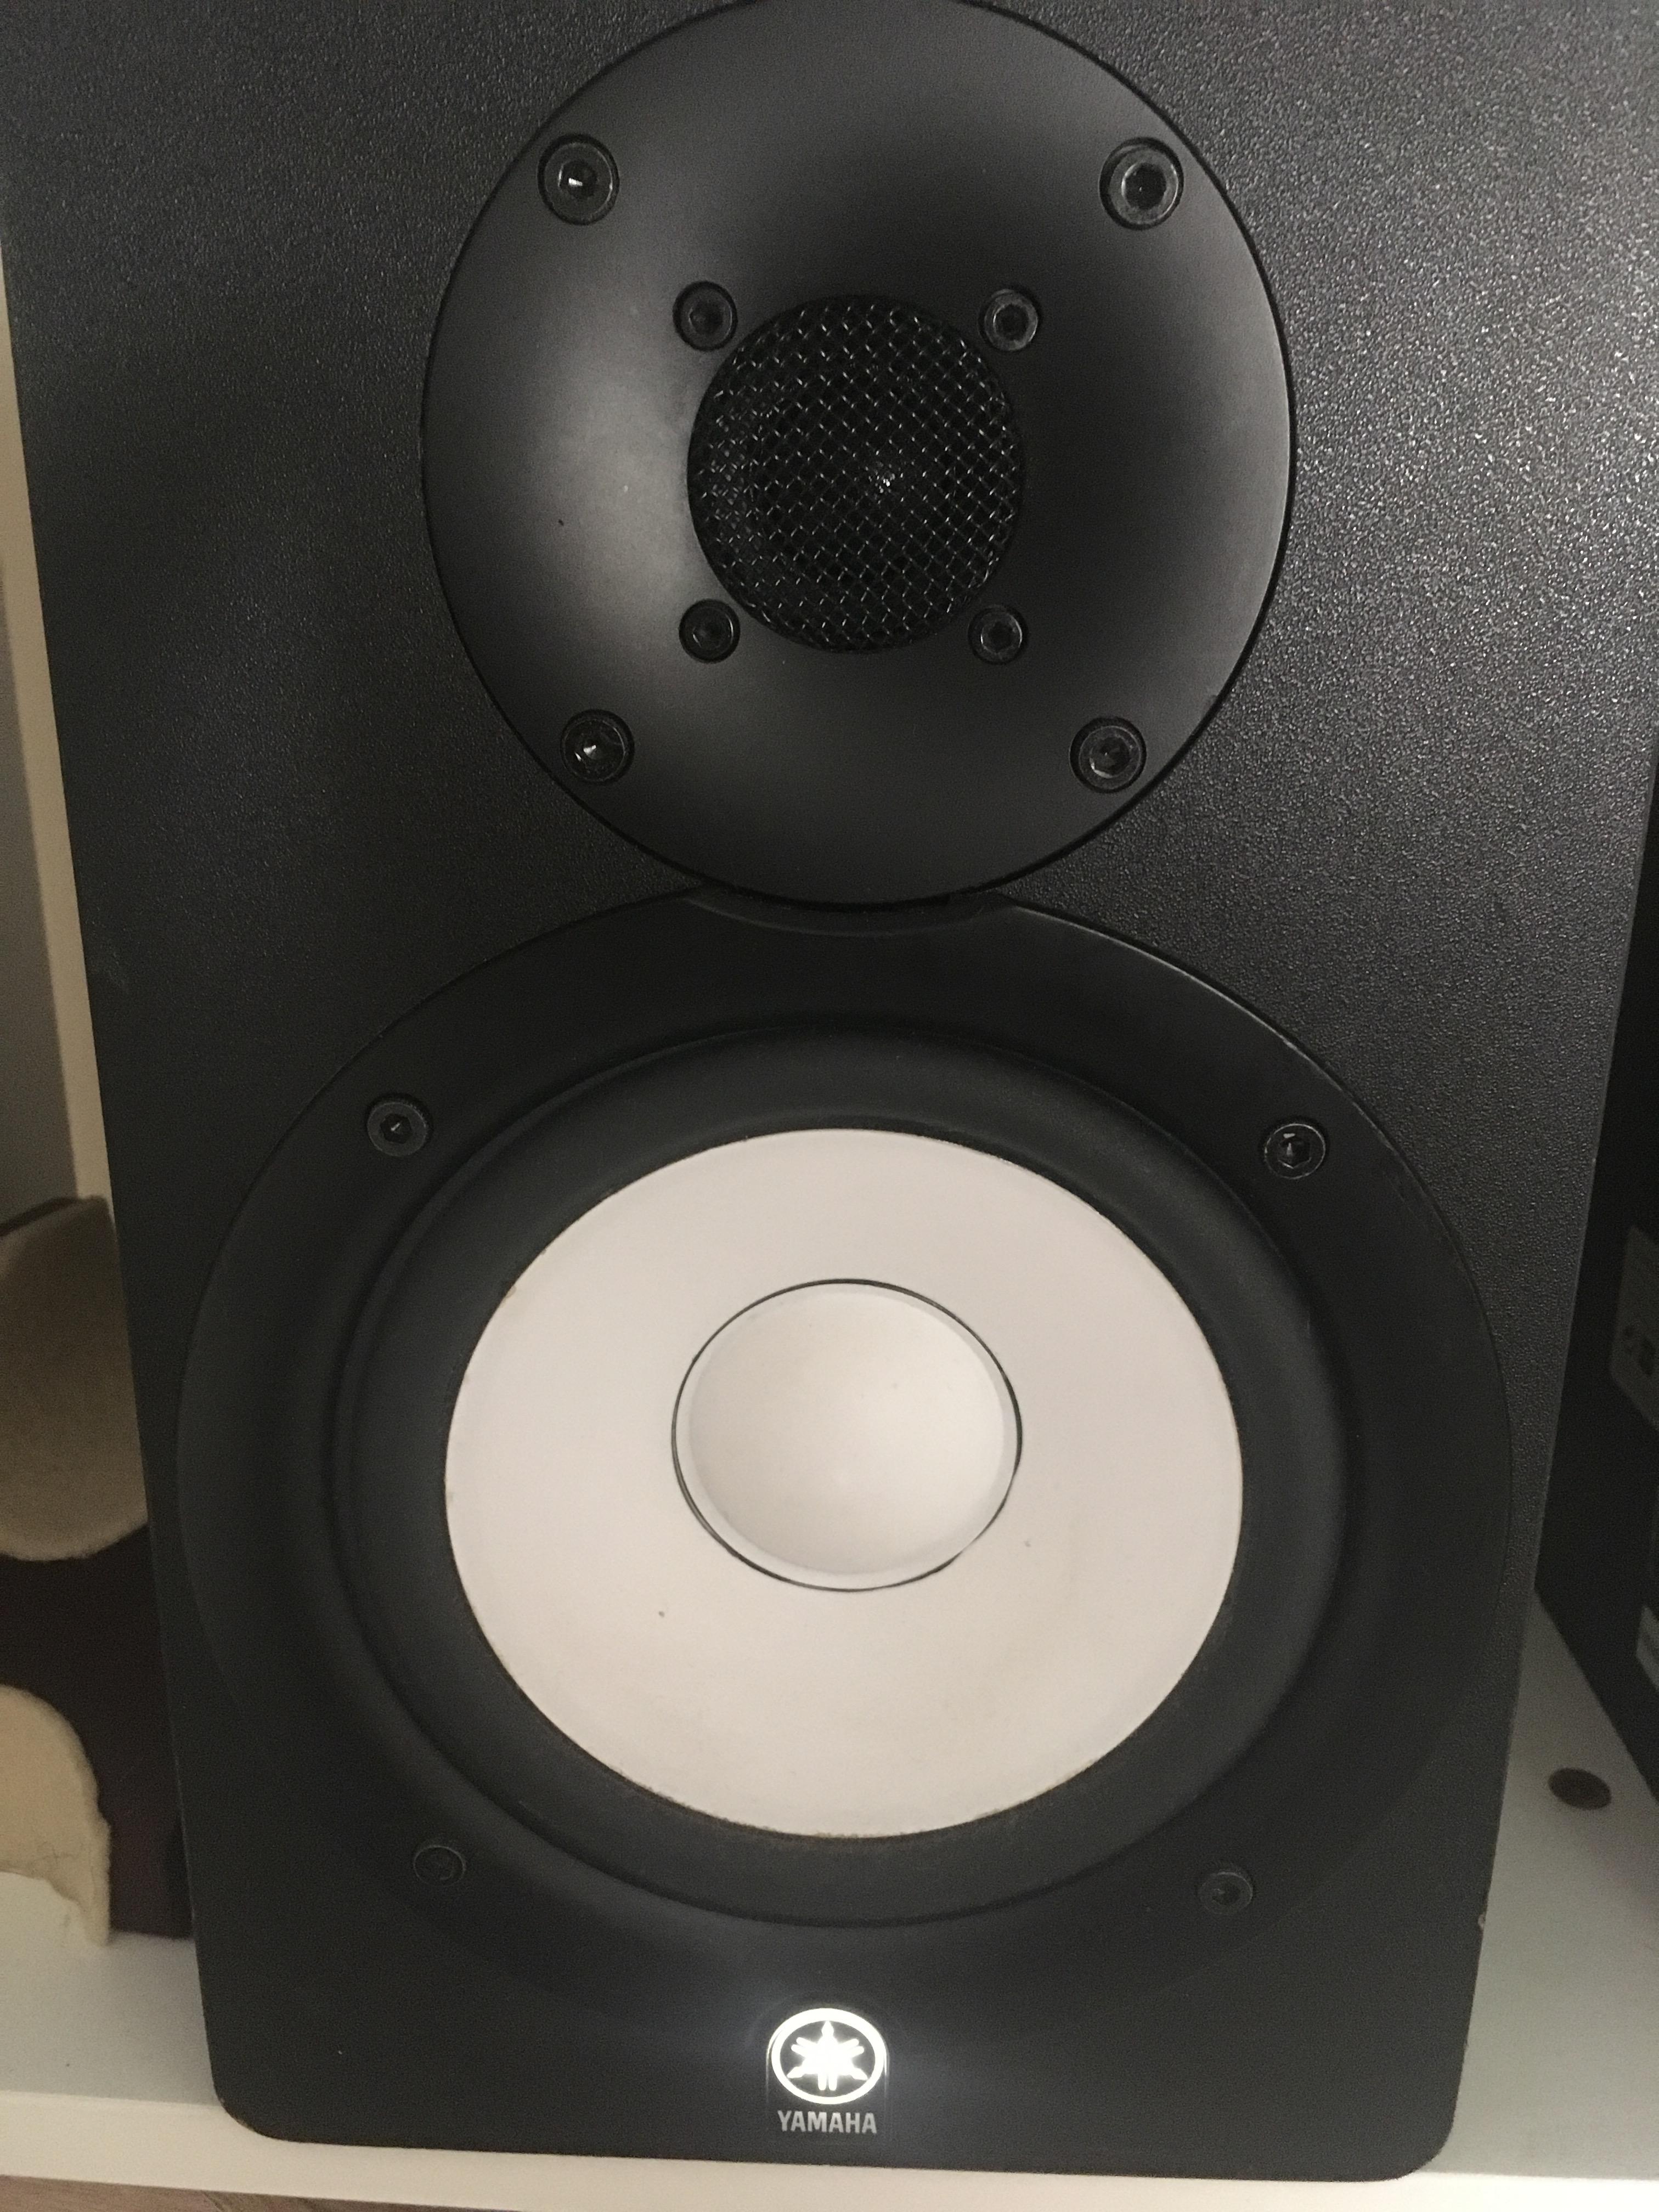 Yamaha hs50m image 2016263 audiofanzine for Yamaha hs50m review